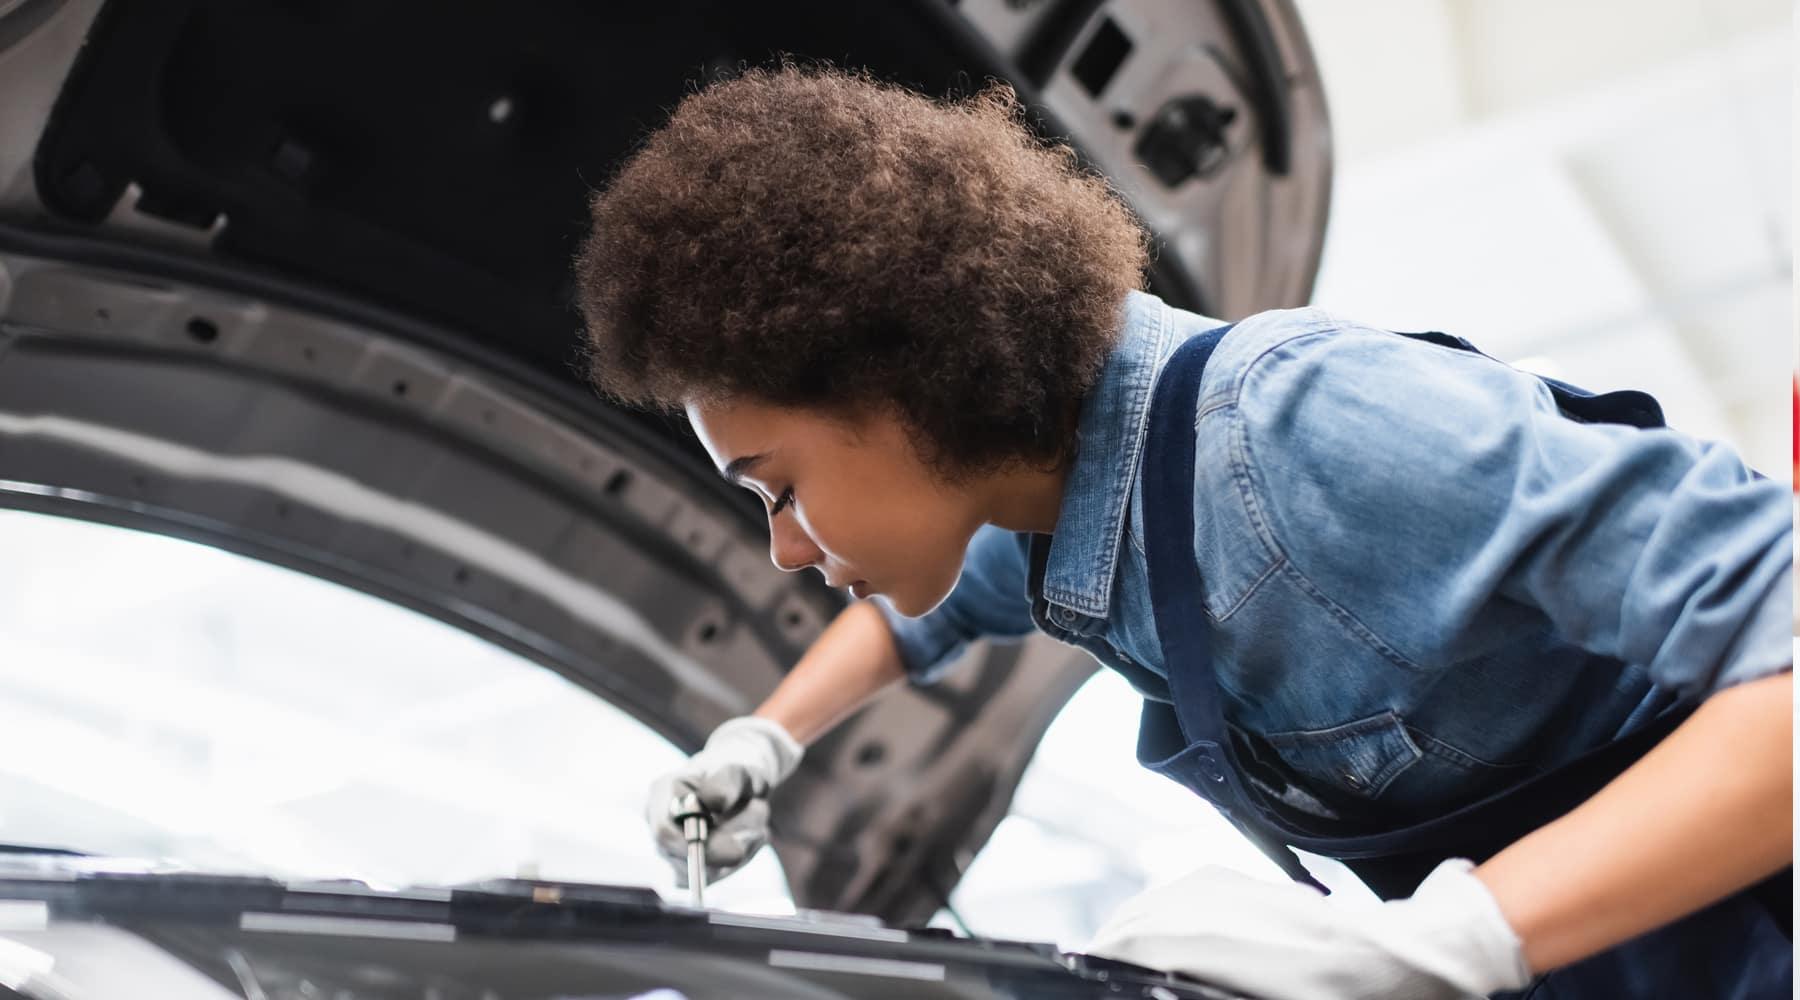 female technician repairing car engine